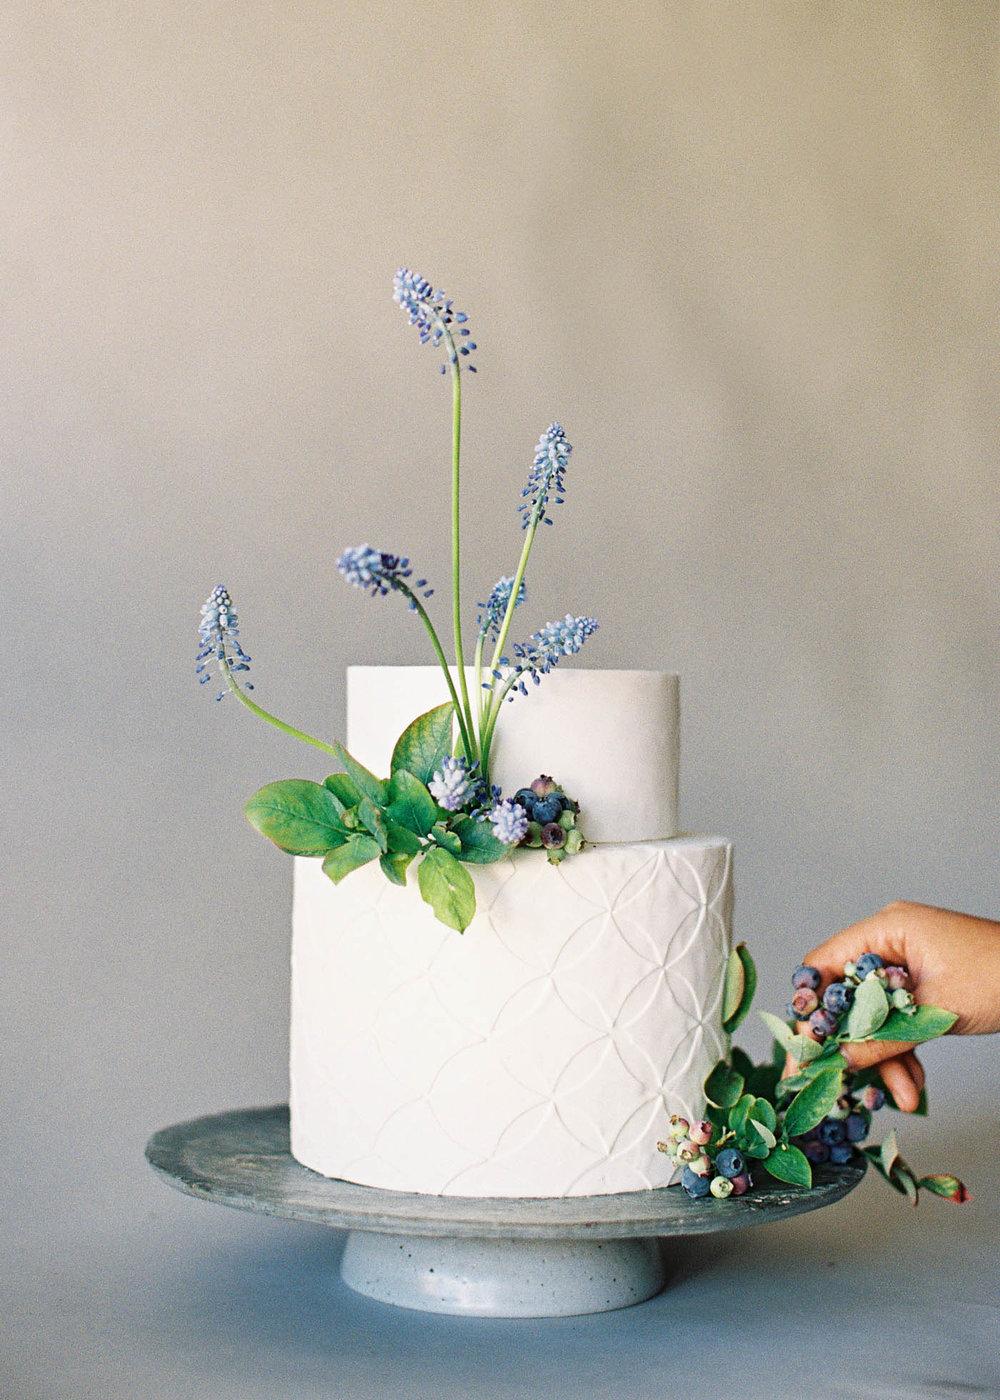 naturalist-cakes-4-Jen_Huang-000485-R1-035-16.jpg